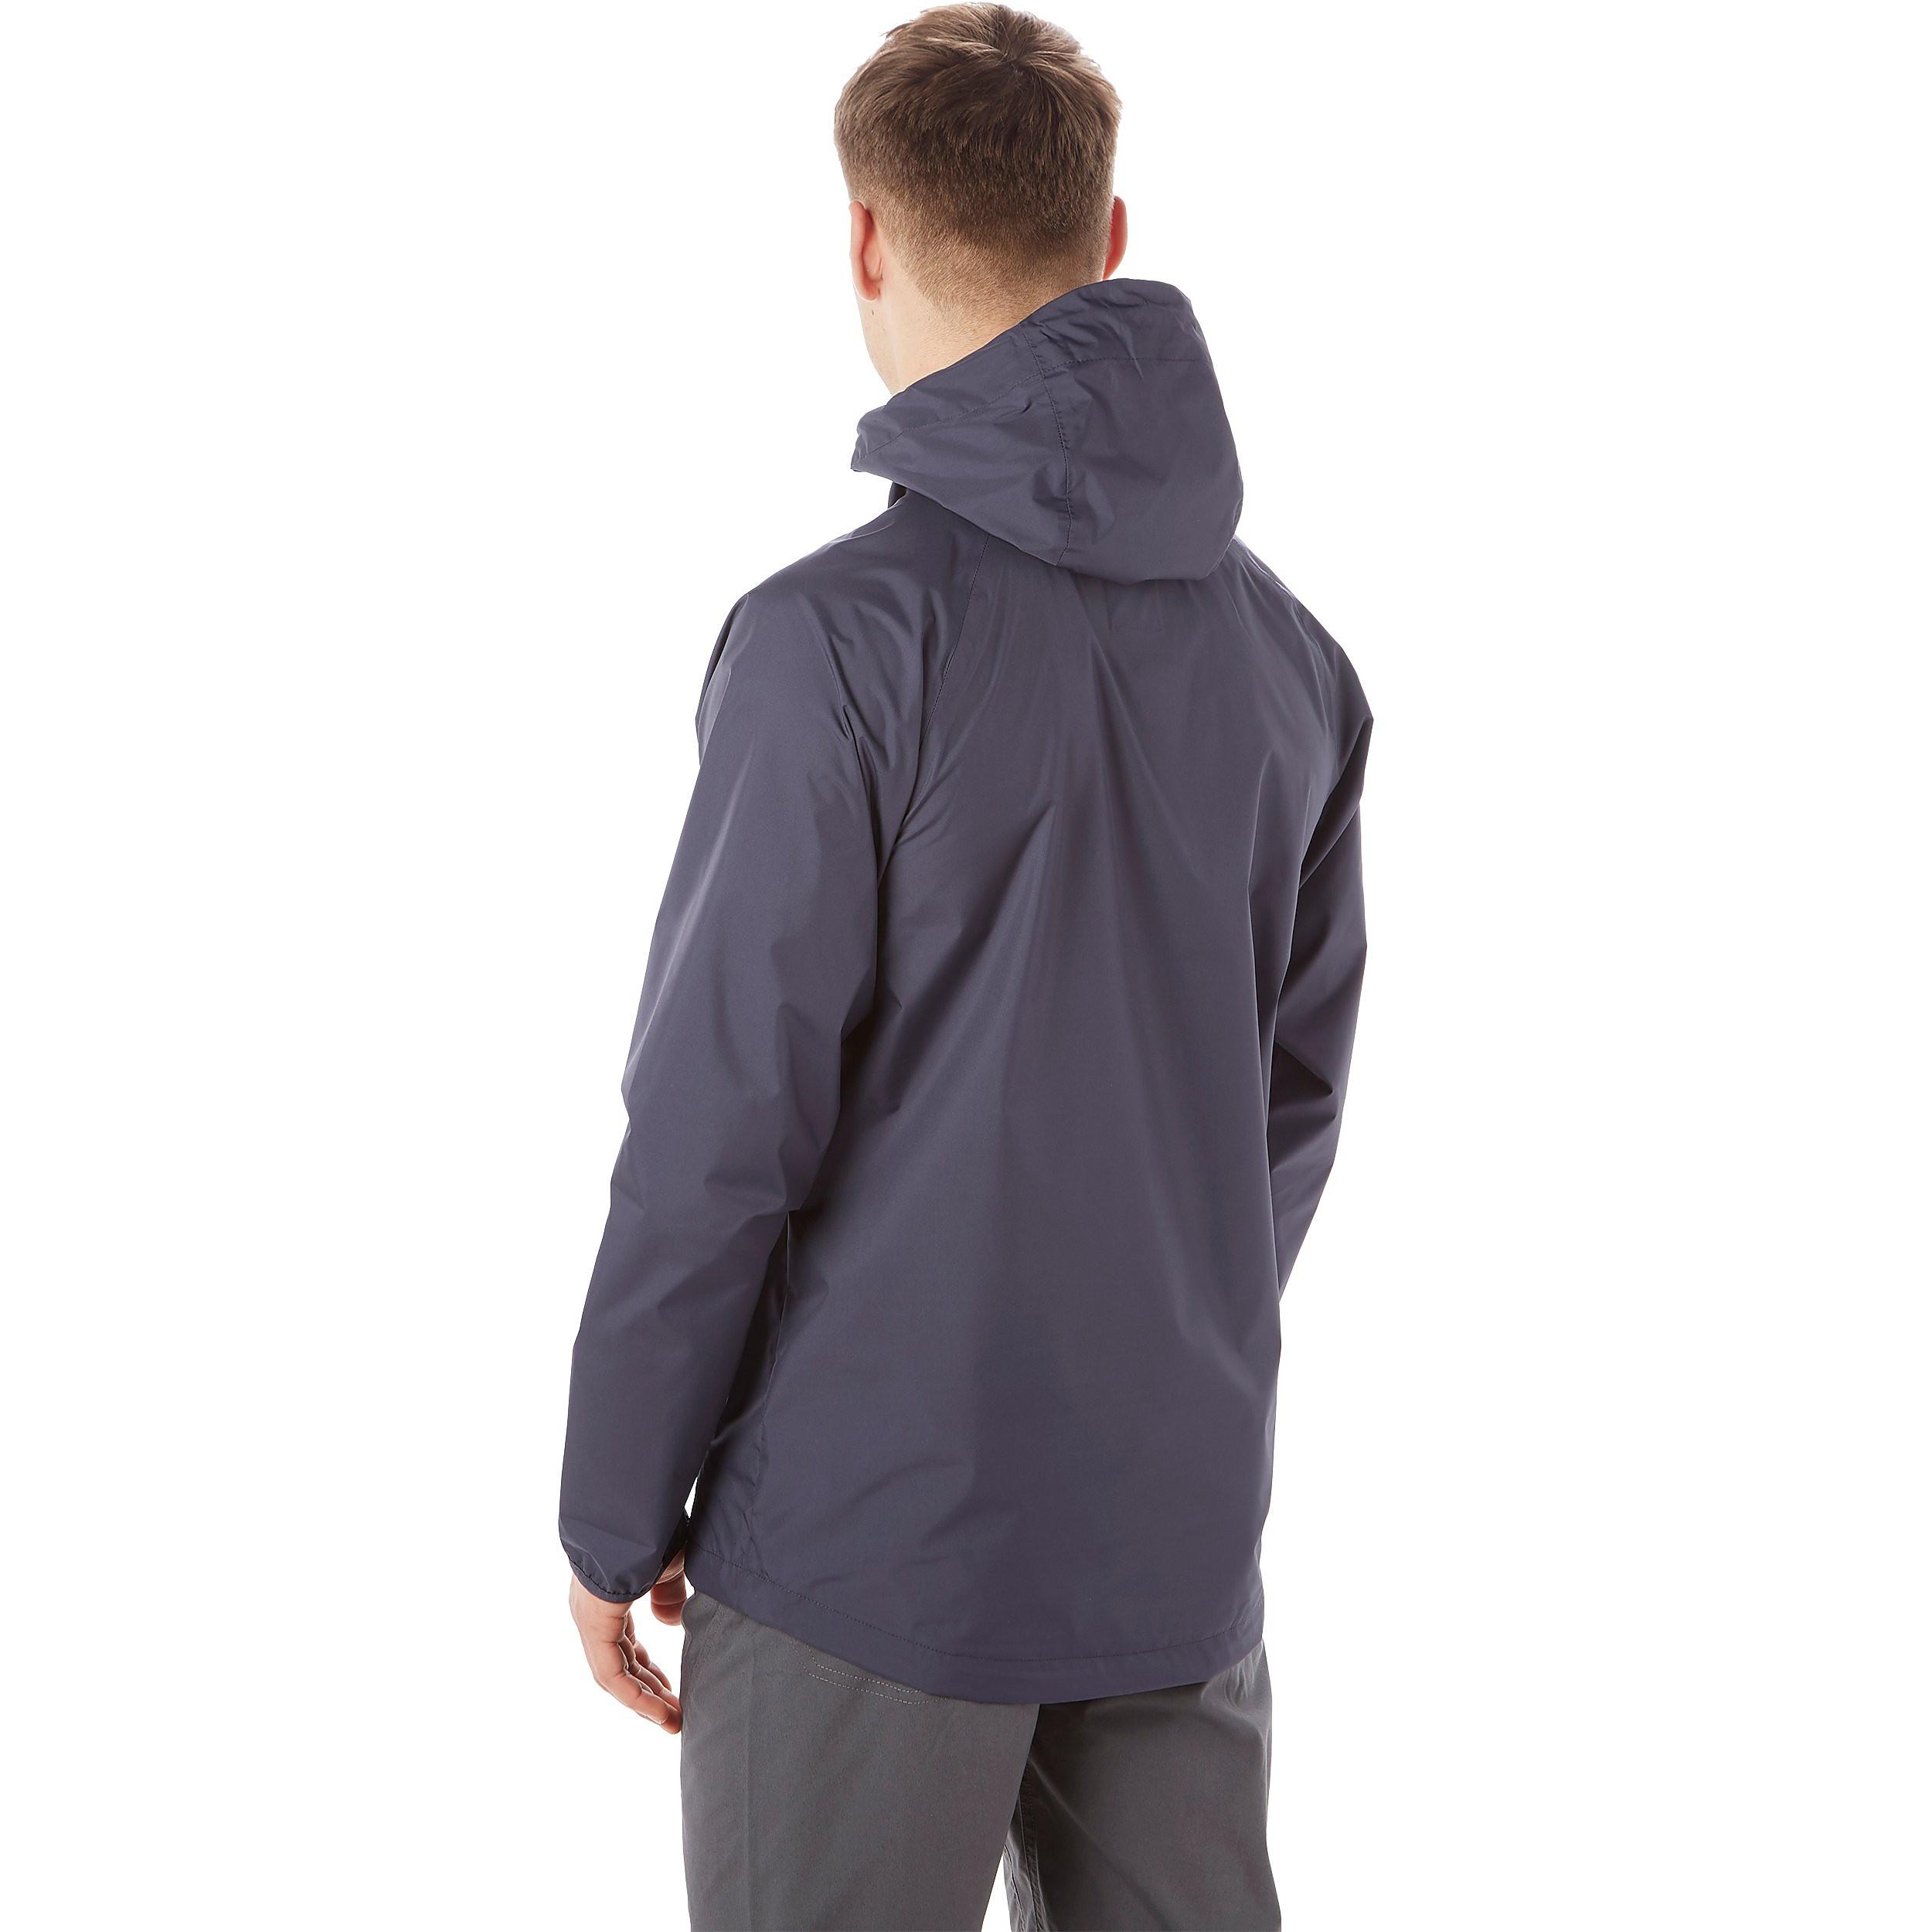 Helly Hansen Loke Packable Anorak Men's Jacket